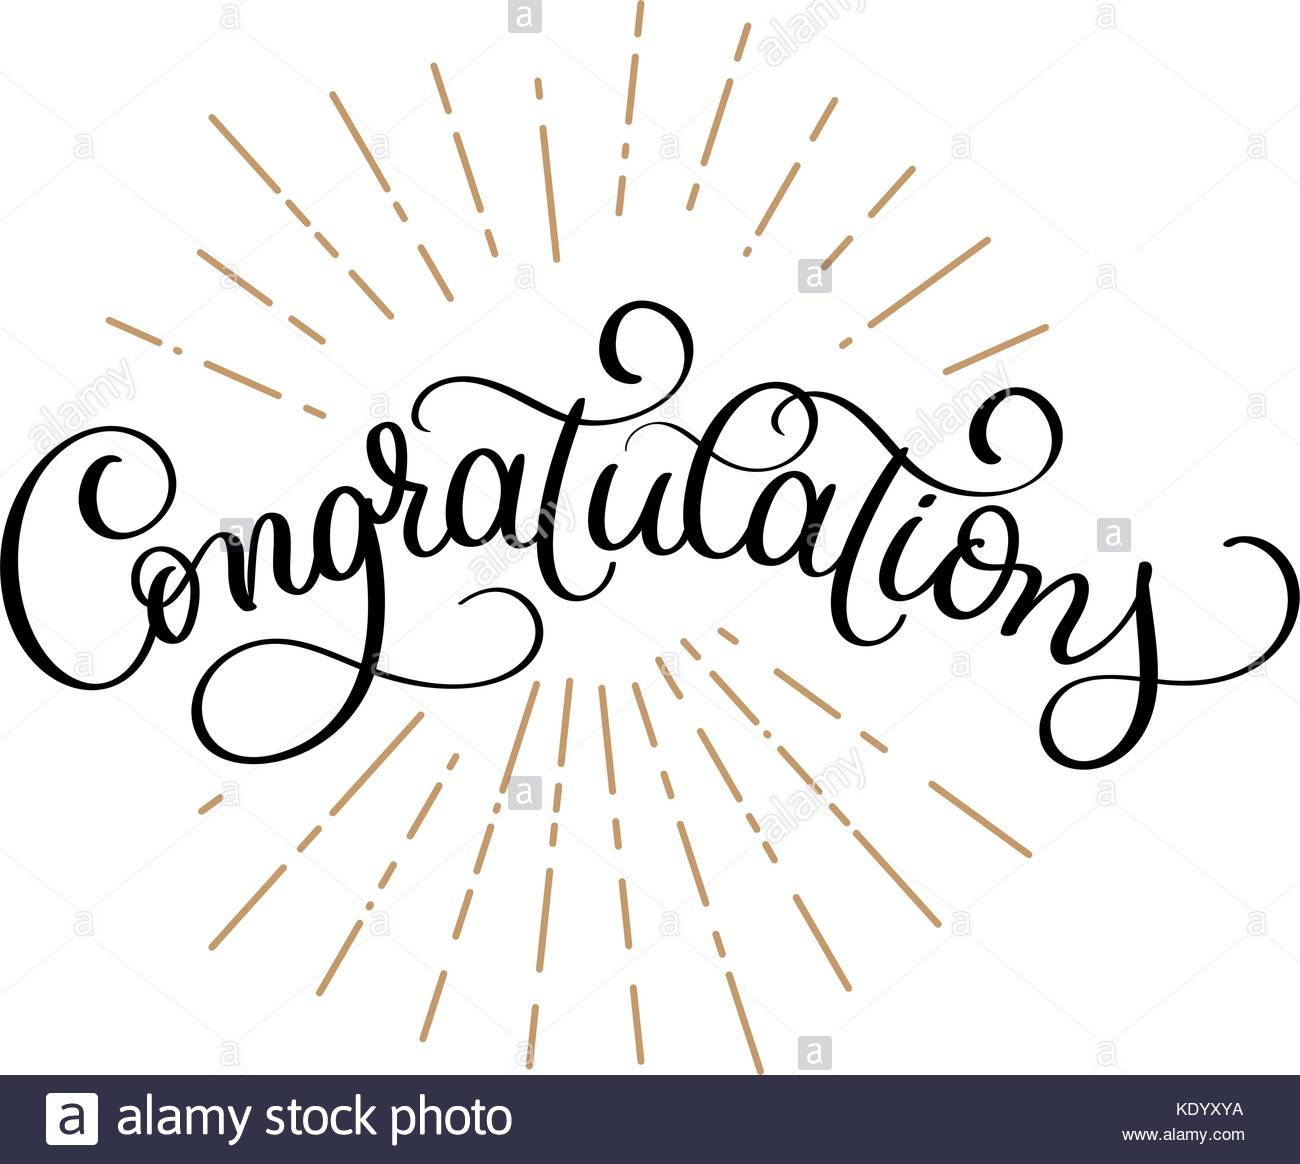 1300x1164 Congratulation Graduate Card Stock Photos Amp Congratulation